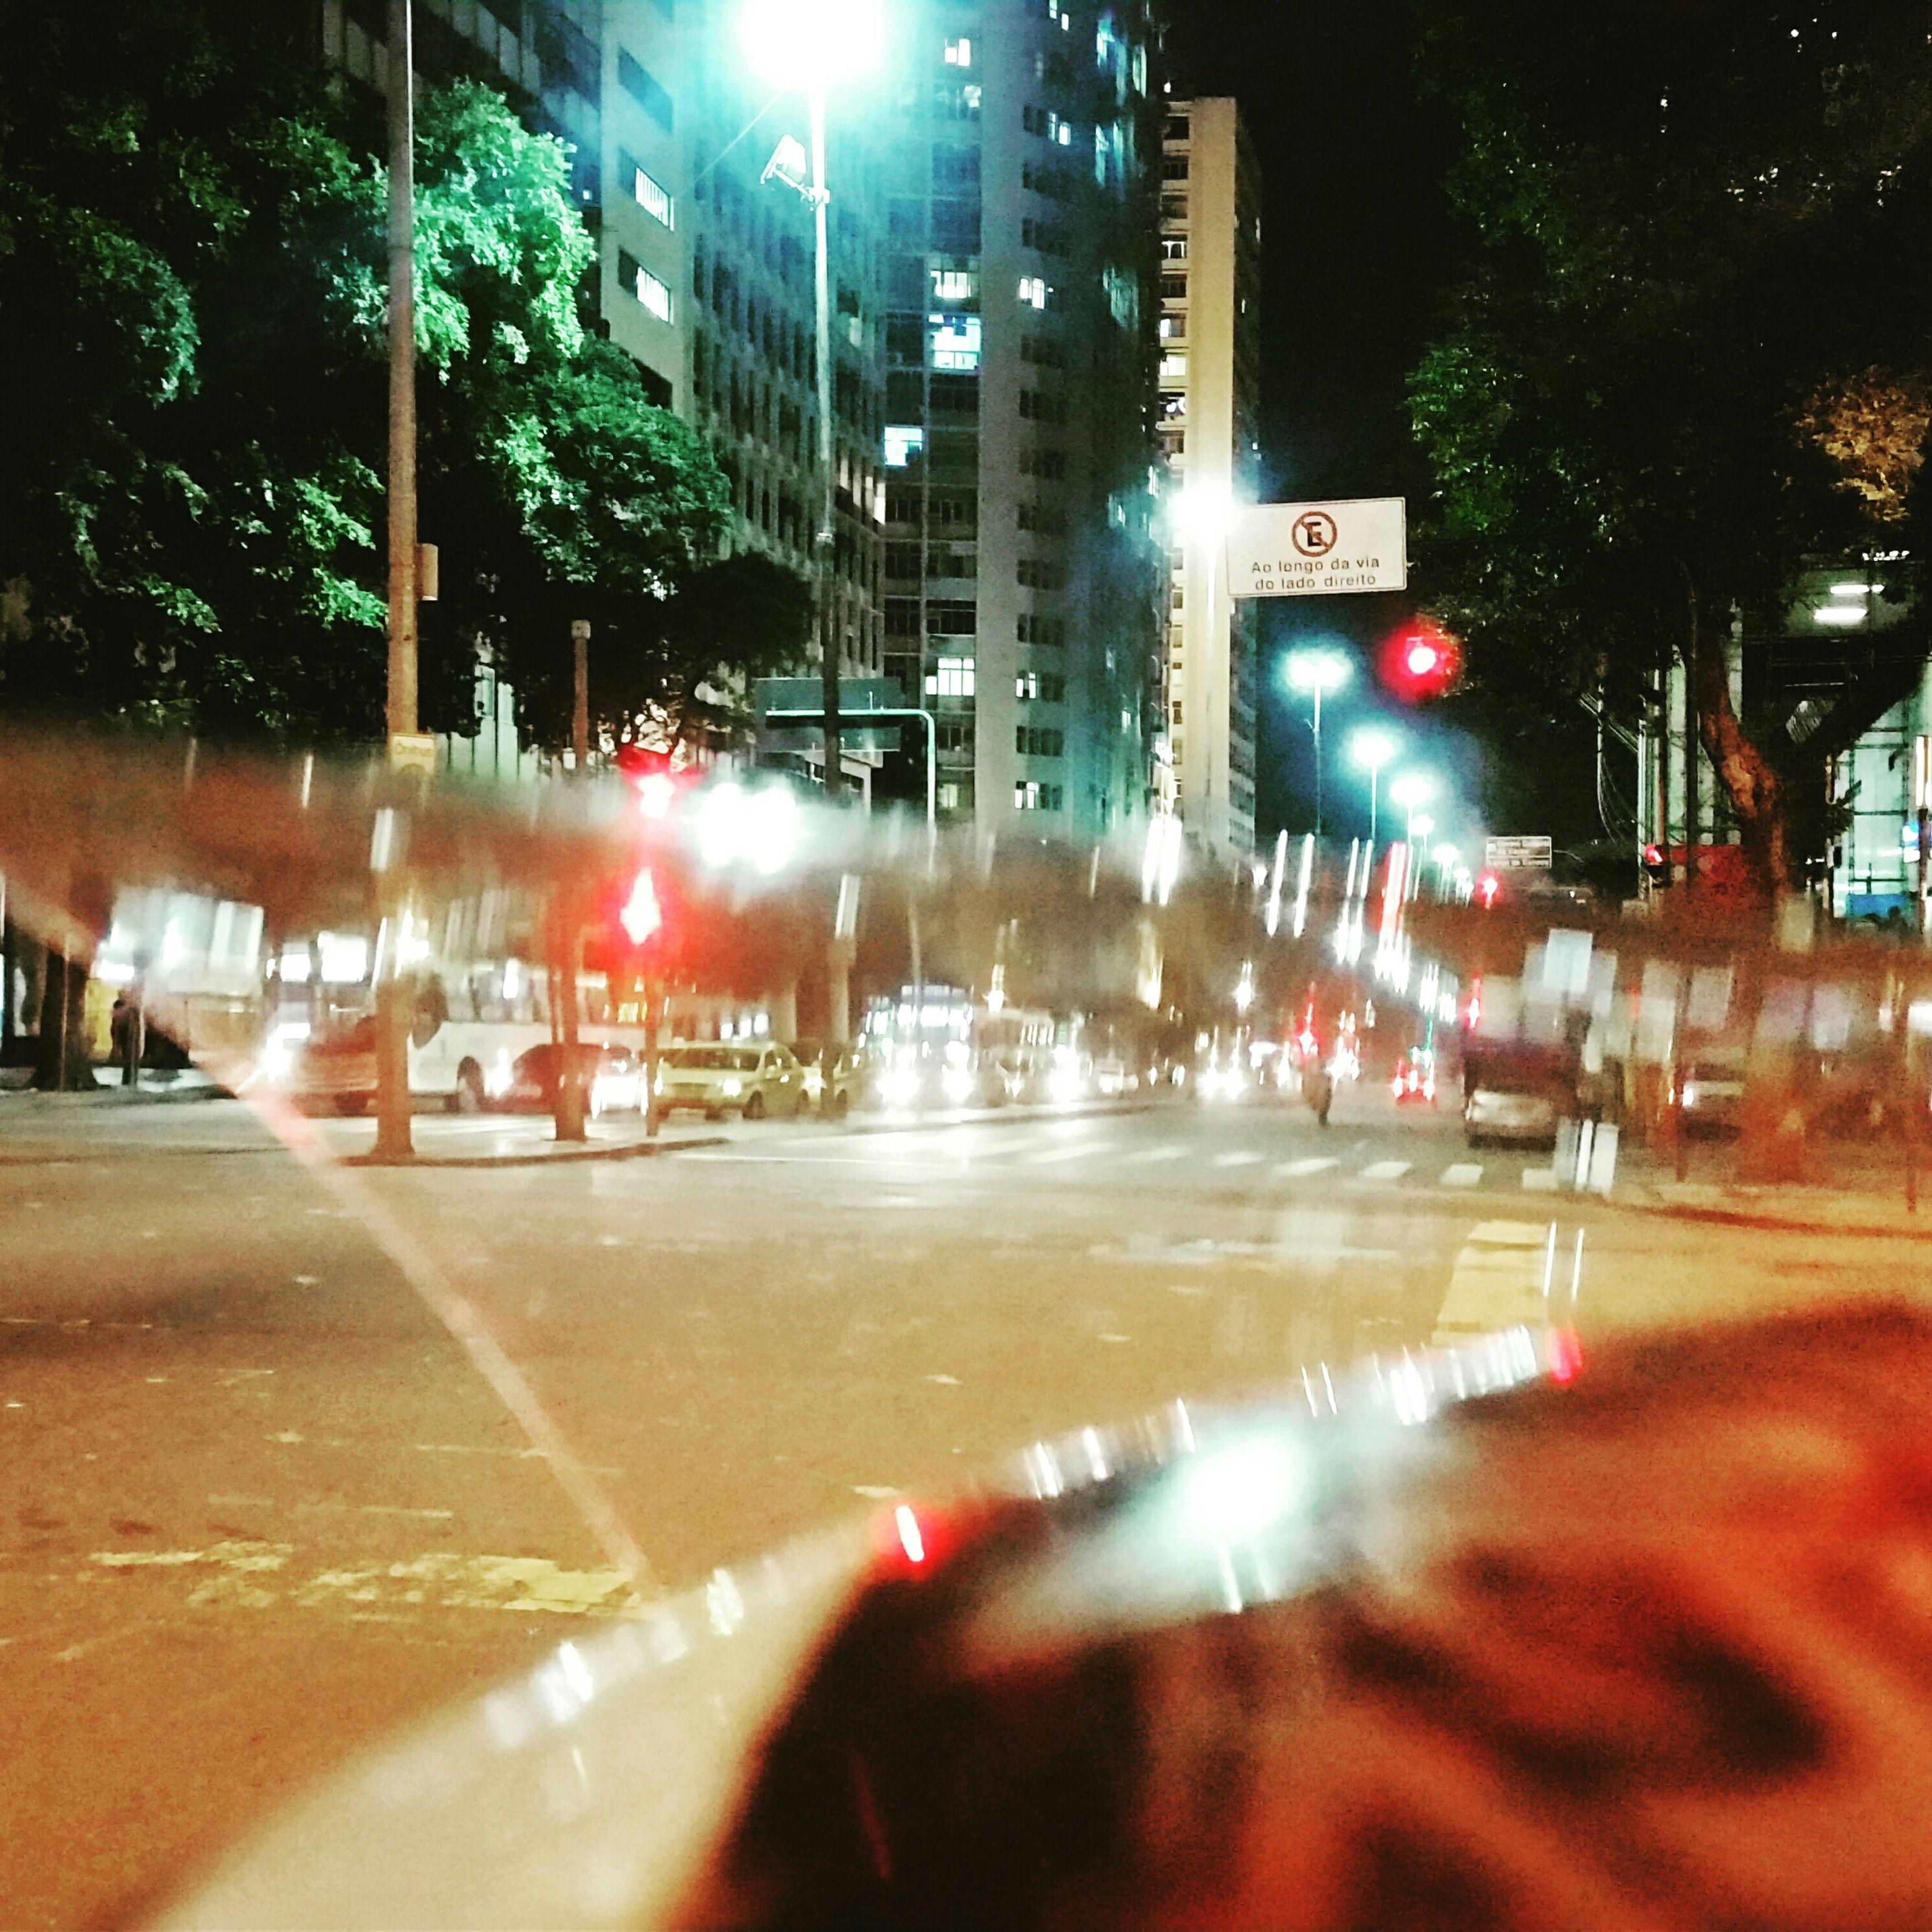 illuminated, city, building exterior, night, street, city street, architecture, city life, built structure, car, transportation, road, street light, motion, land vehicle, traffic, incidental people, blurred motion, zebra crossing